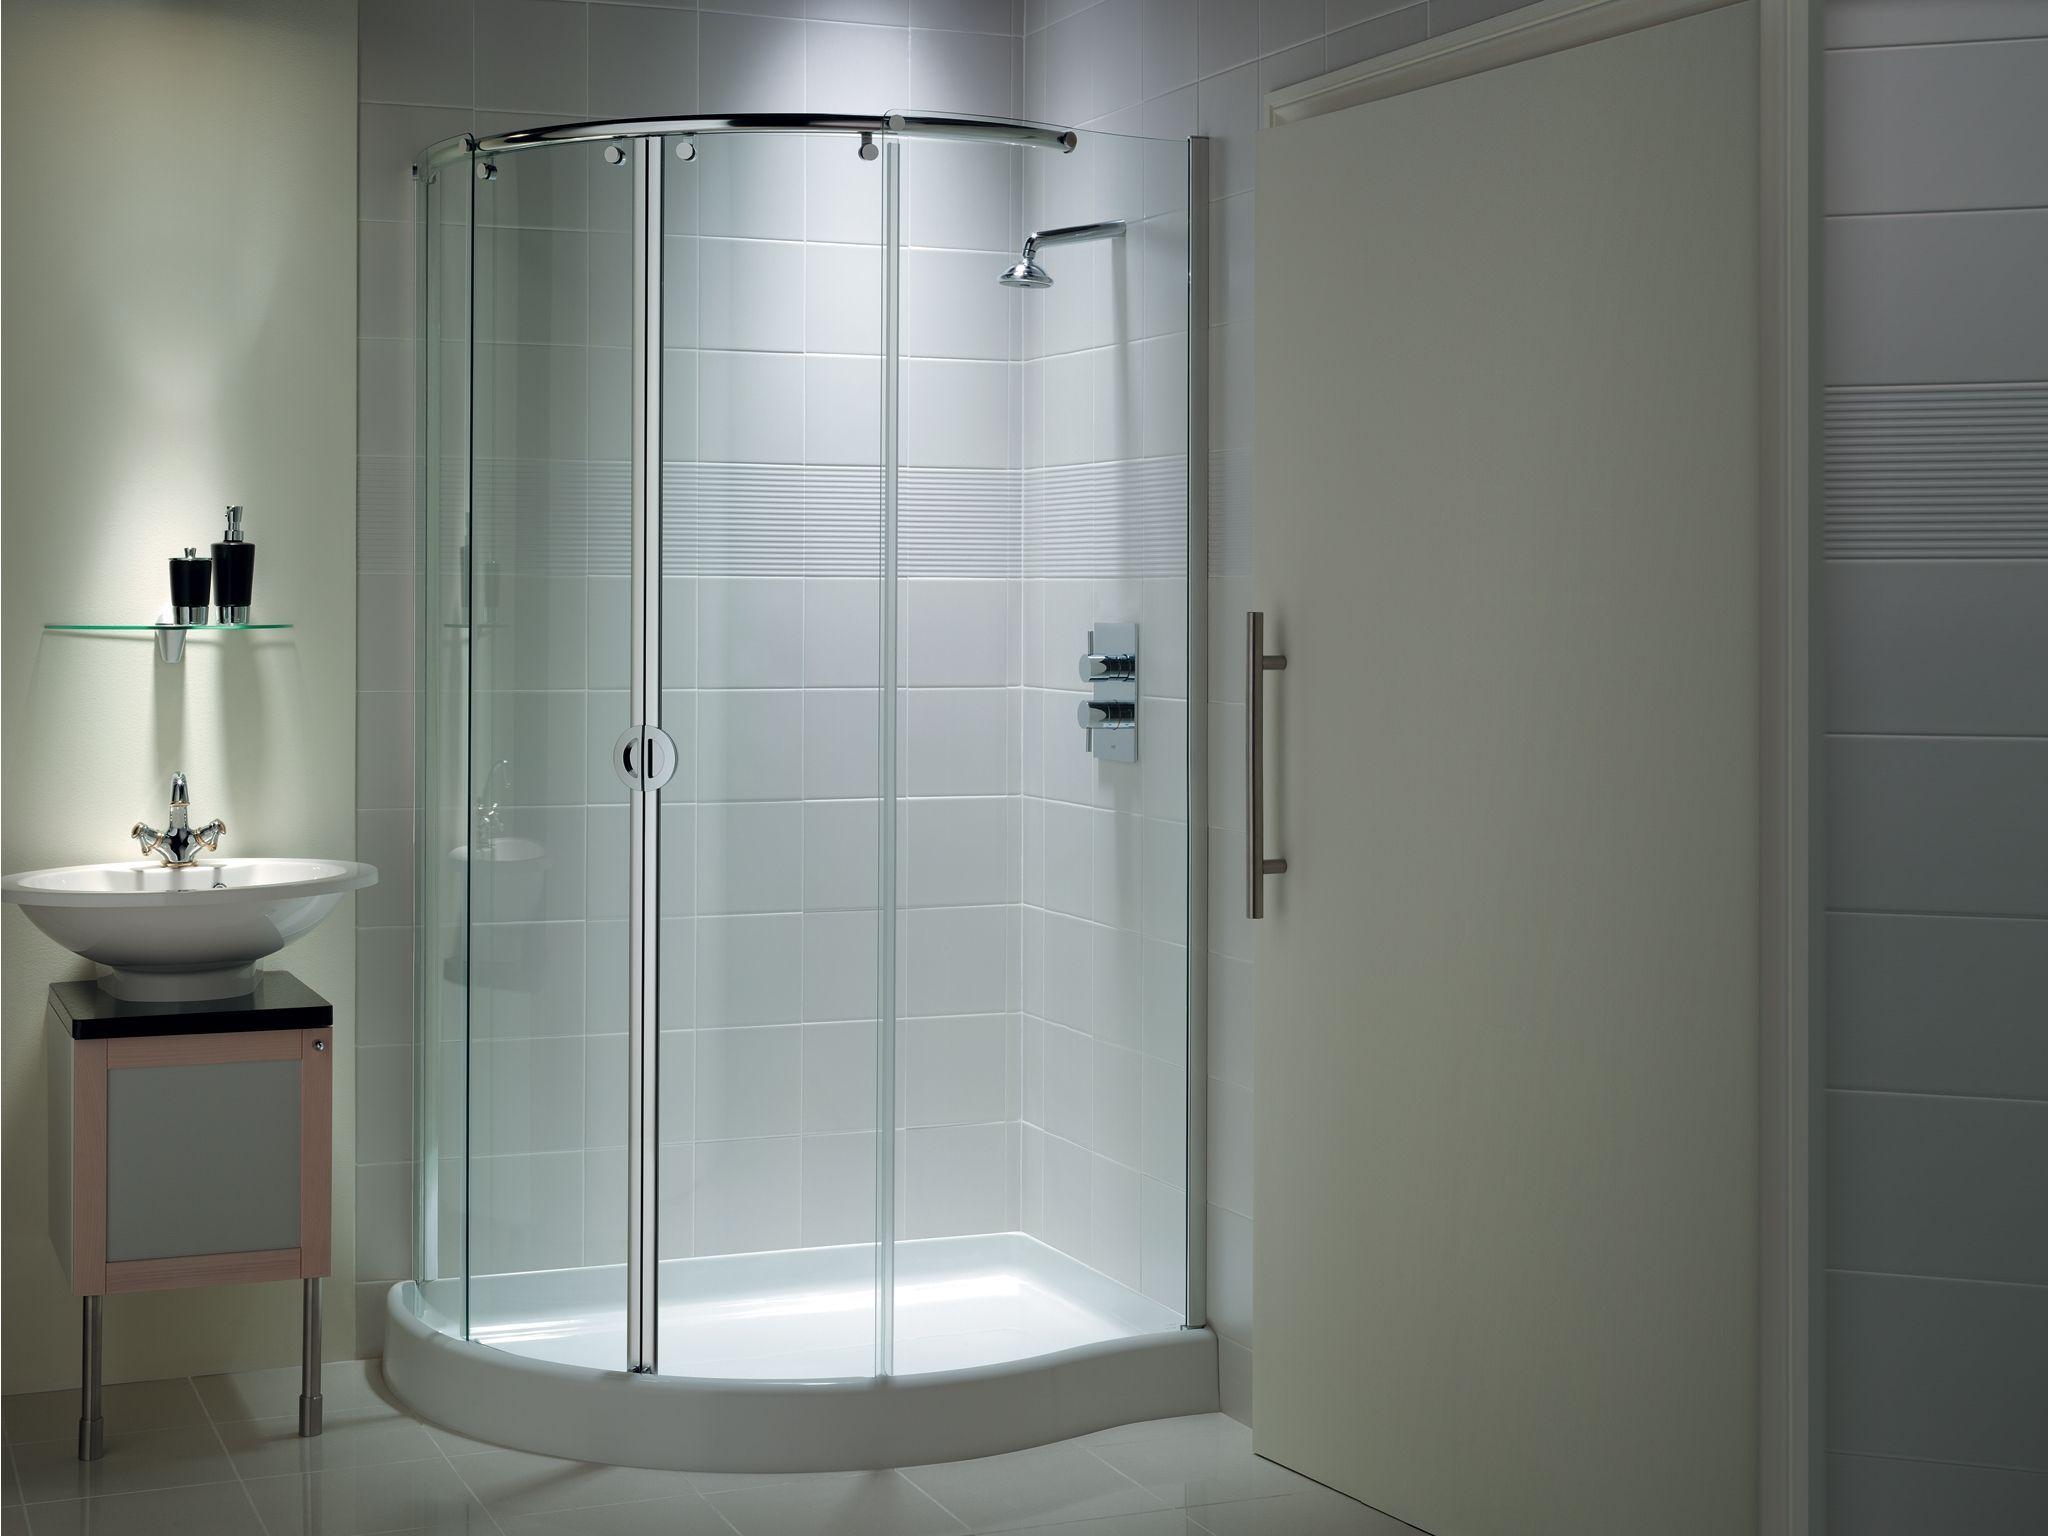 Round Corner Shower Sliding Door Bathrooms In 2019 Corner Shower